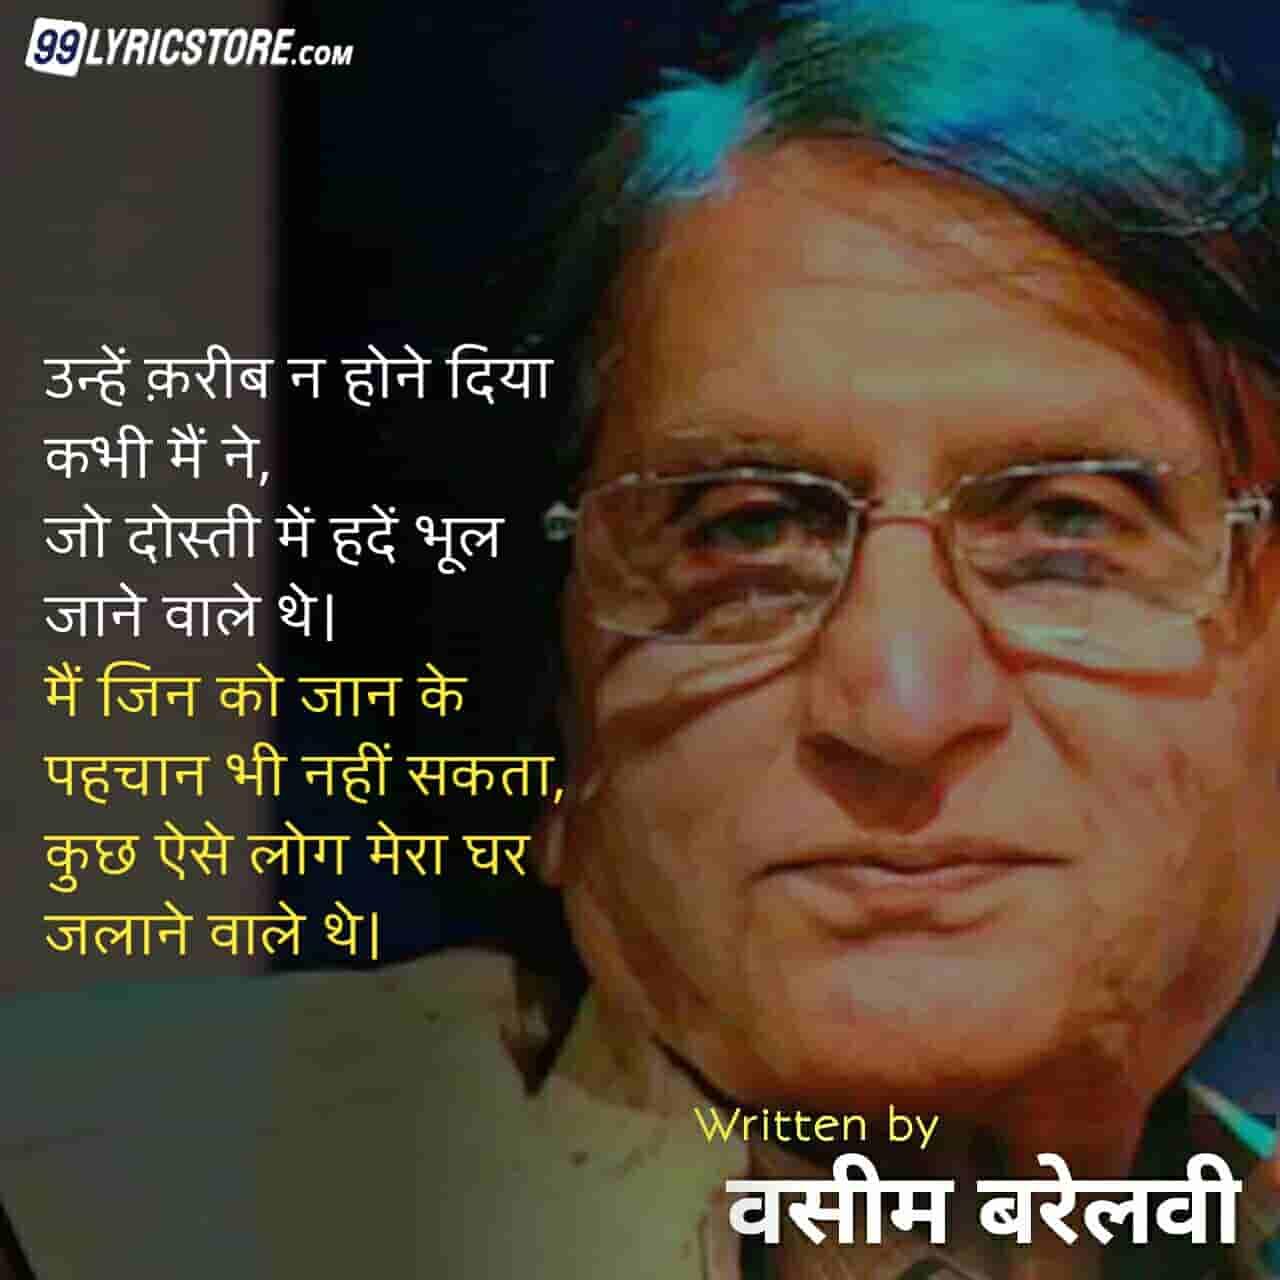 This beautiful Ghazal 'Bhala Gamo Se Kahan Haar Jaane Wale The' has written by Waseem Barelvi.